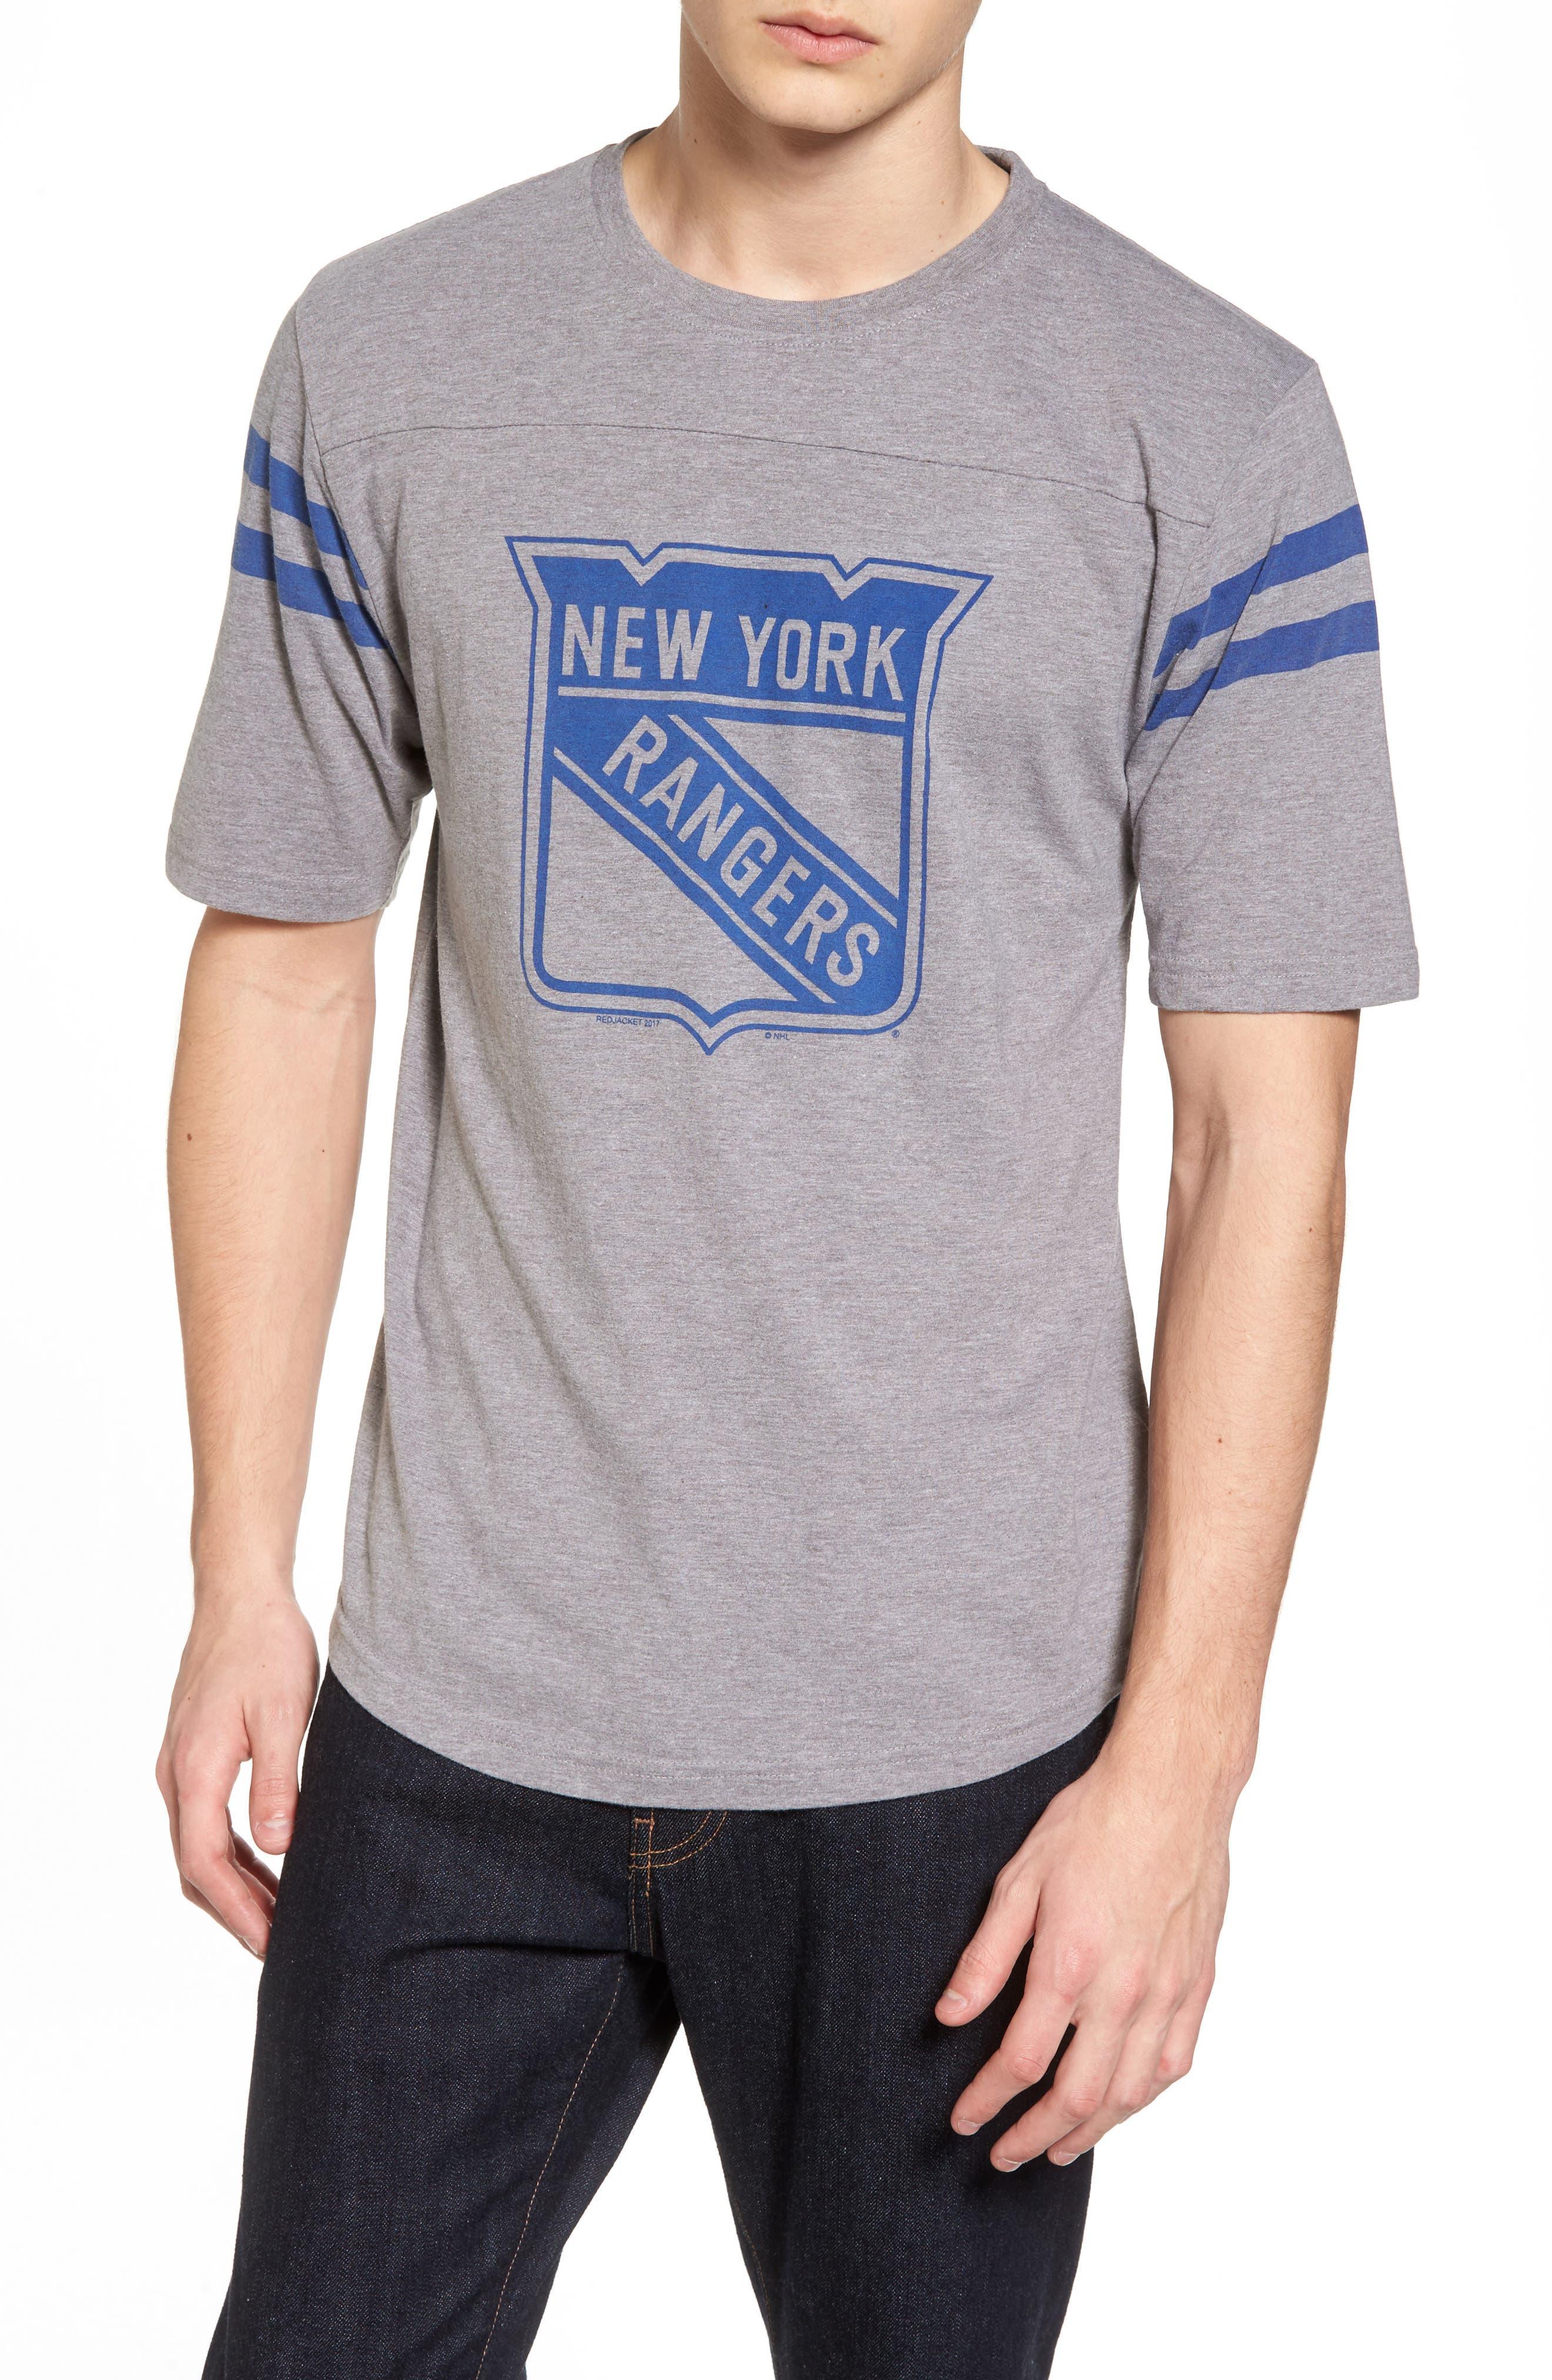 American Needle Crosby New York Rangers T-Shirt